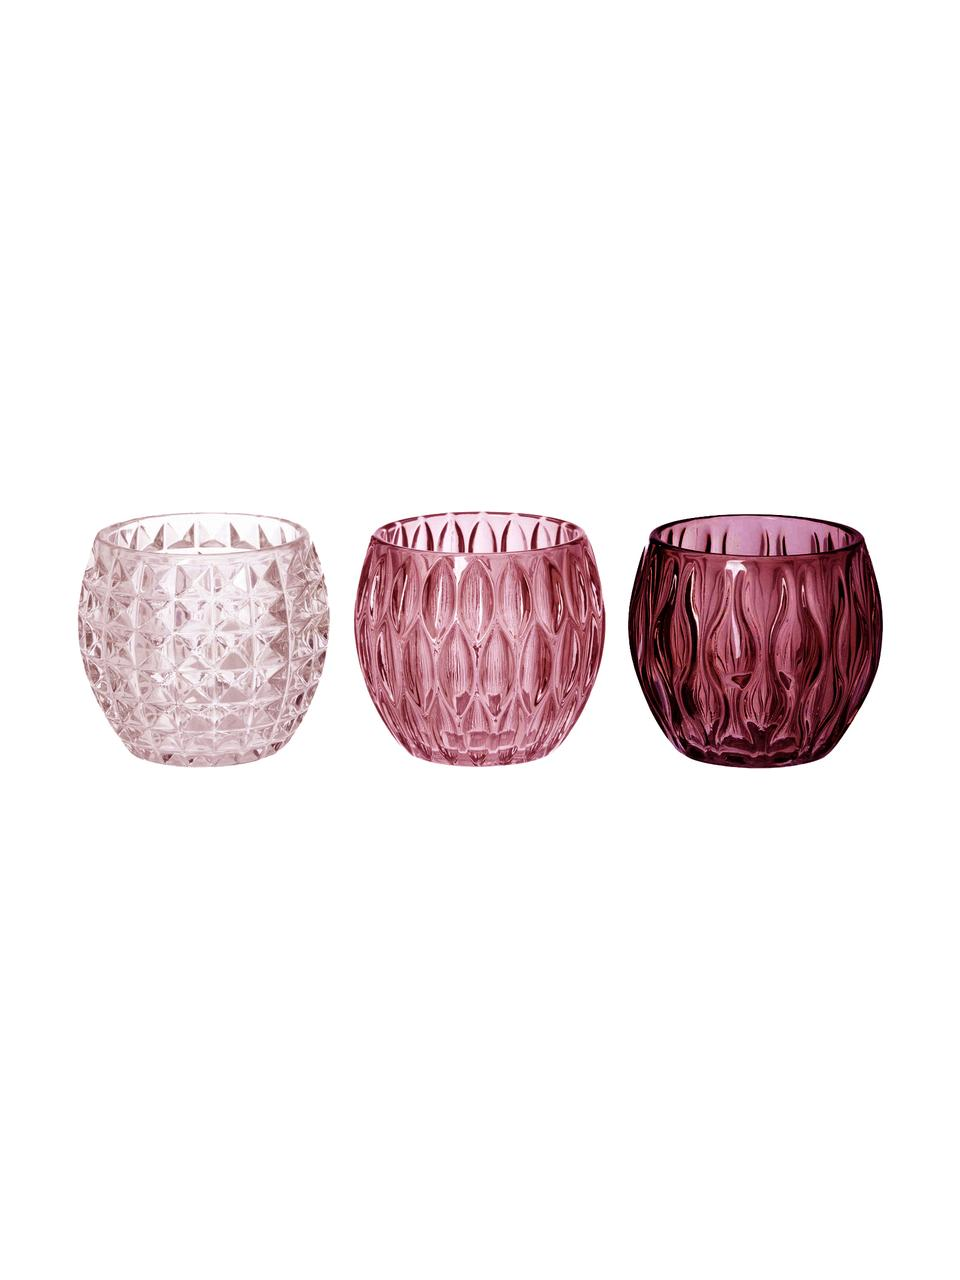 Teelichthalter-Set Aliza, 3-tlg., Glas, Rosatöne, Transparent, Ø 10 x H 9 cm